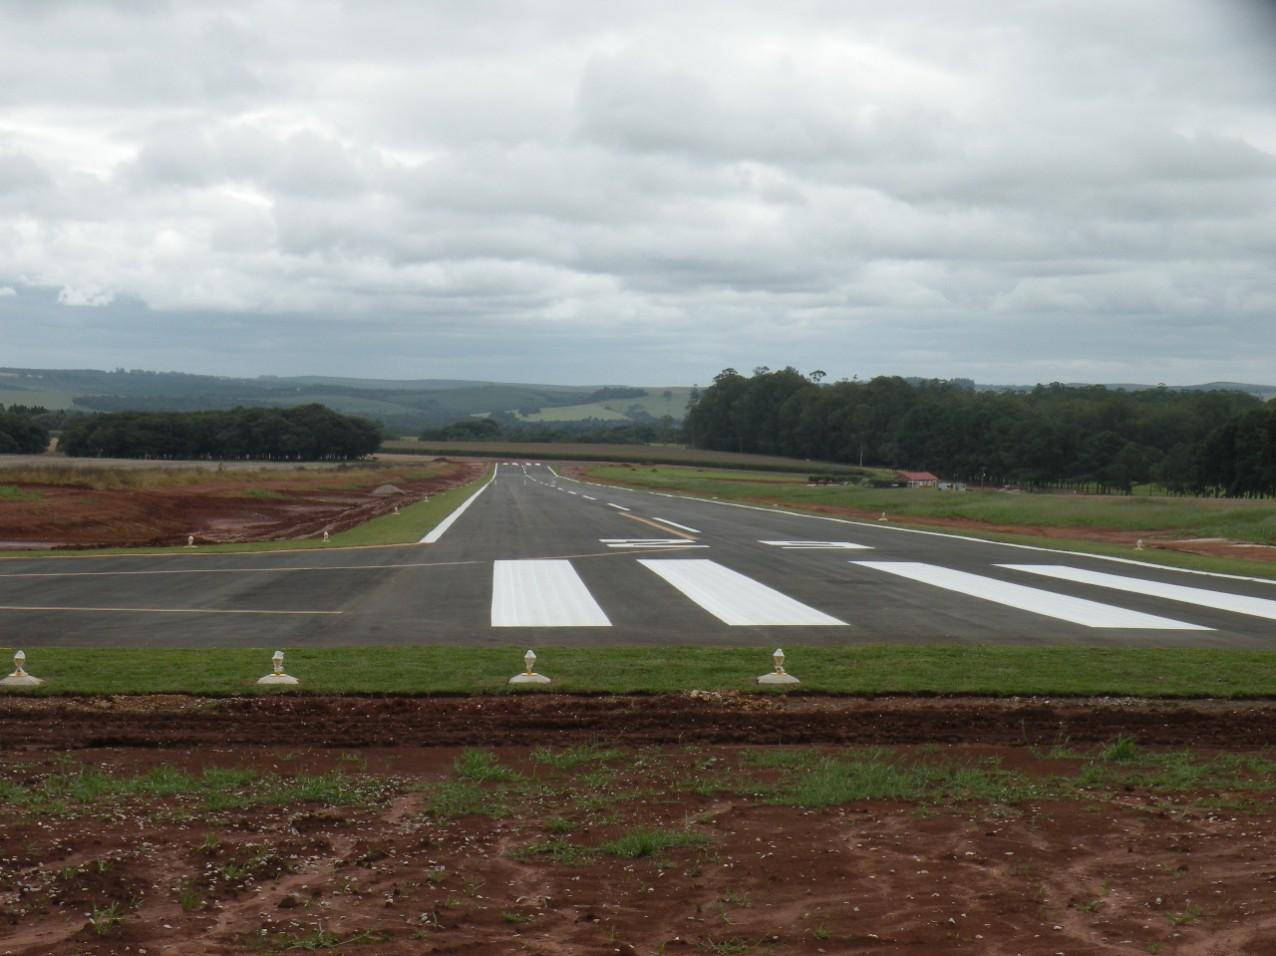 Obra especial - Aerodromo Particular - Pista de pouso